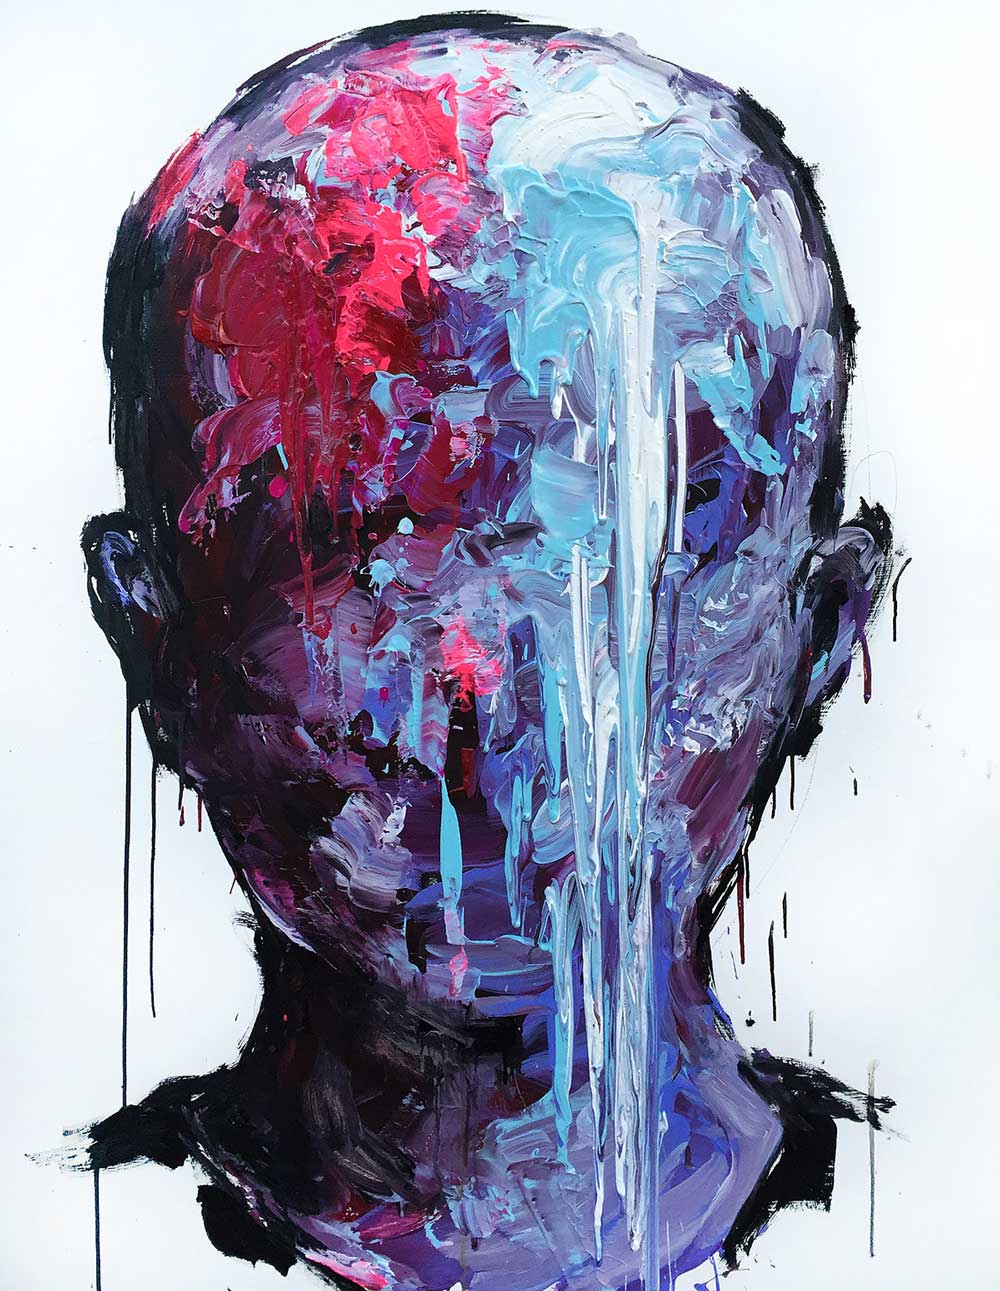 Retrato de tonalidades azules y rojas del artista KwangHo Shin